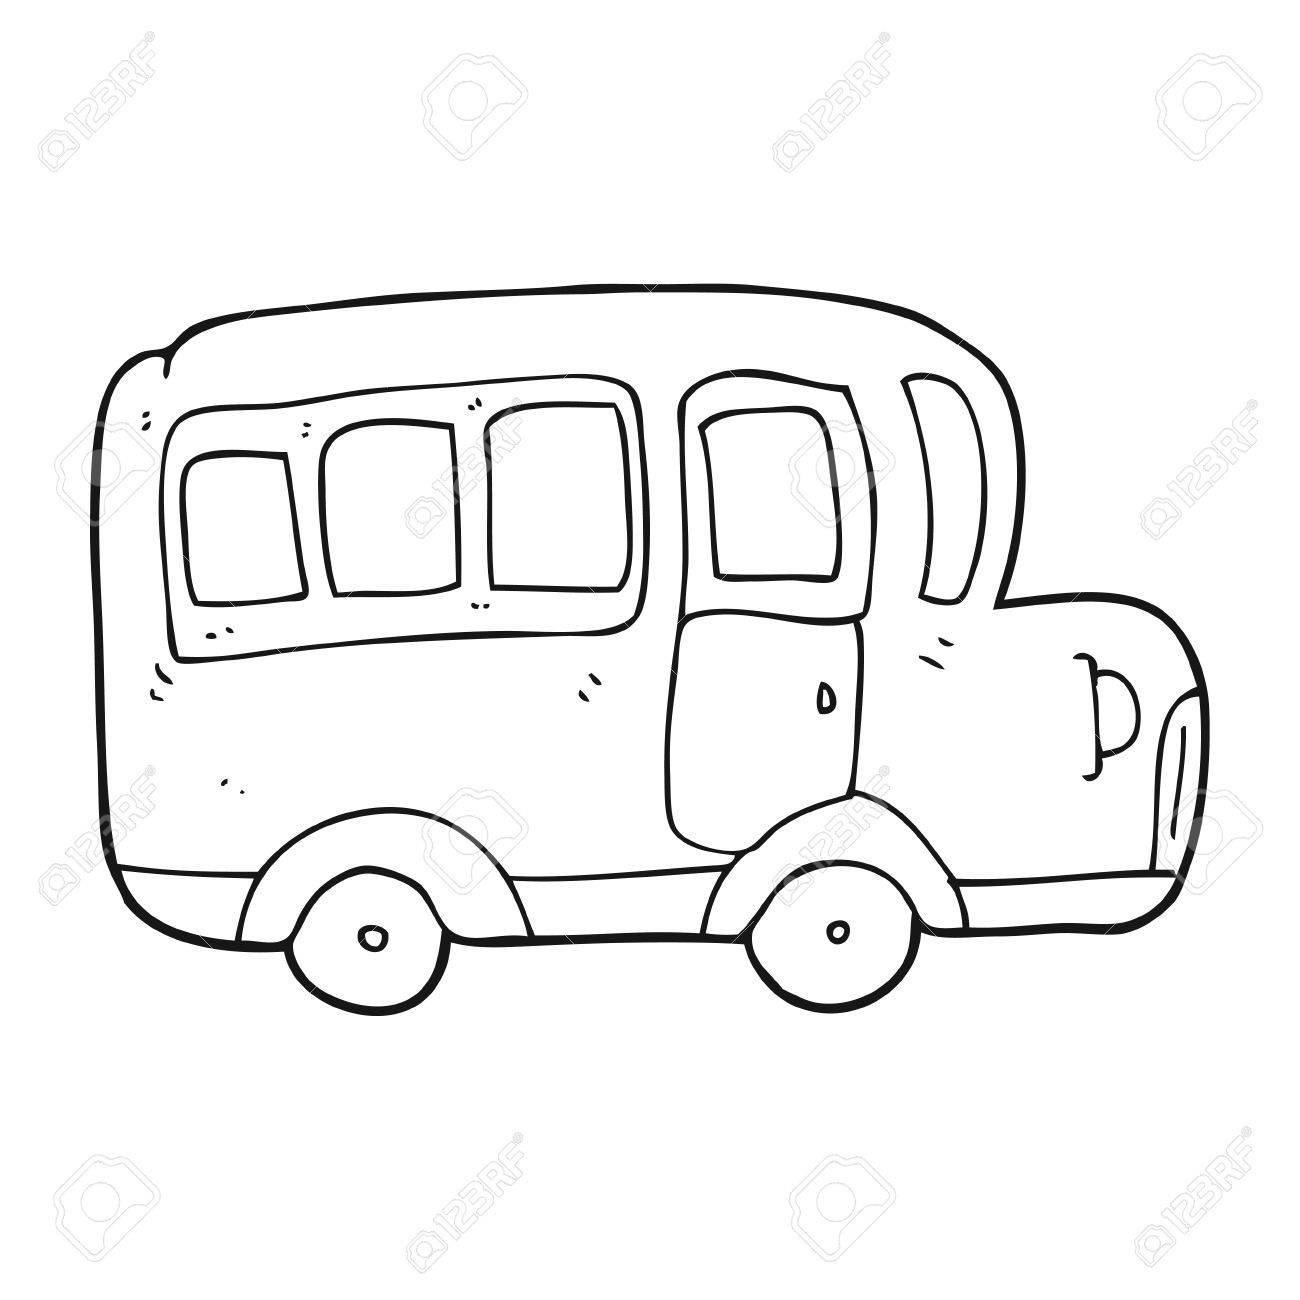 1300x1300 Freehand Drawn Black And White Cartoon Yellow School Bus Royalty